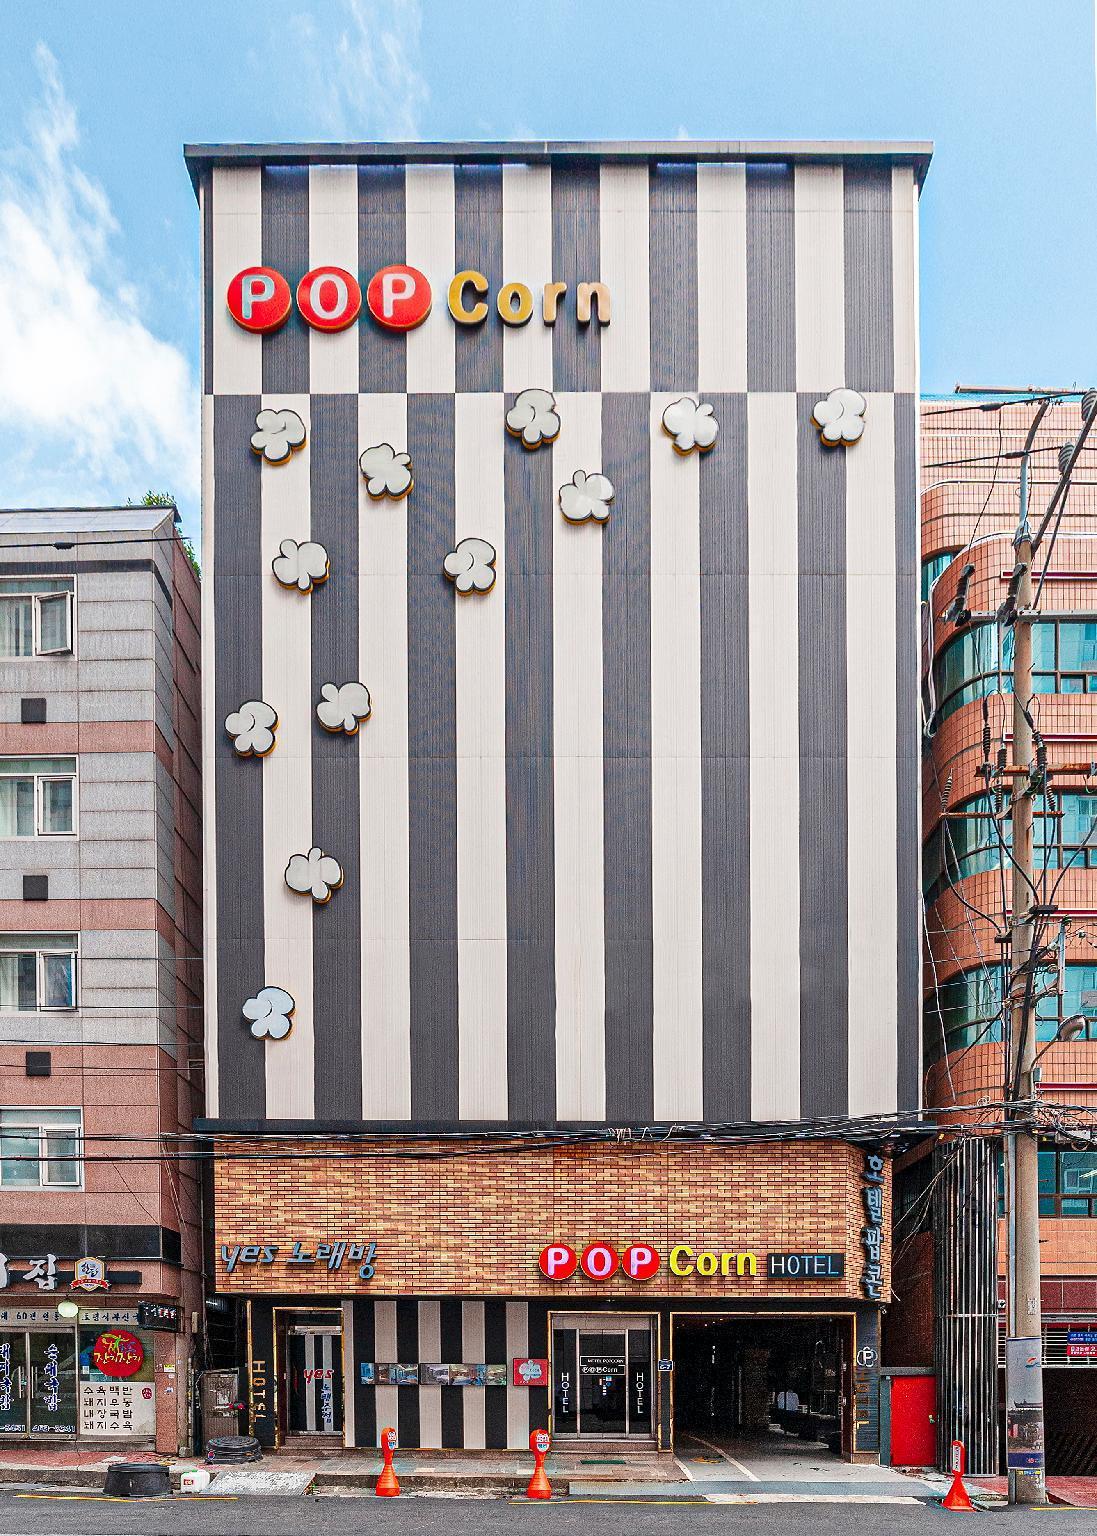 Busan Station Popcorn Hotel